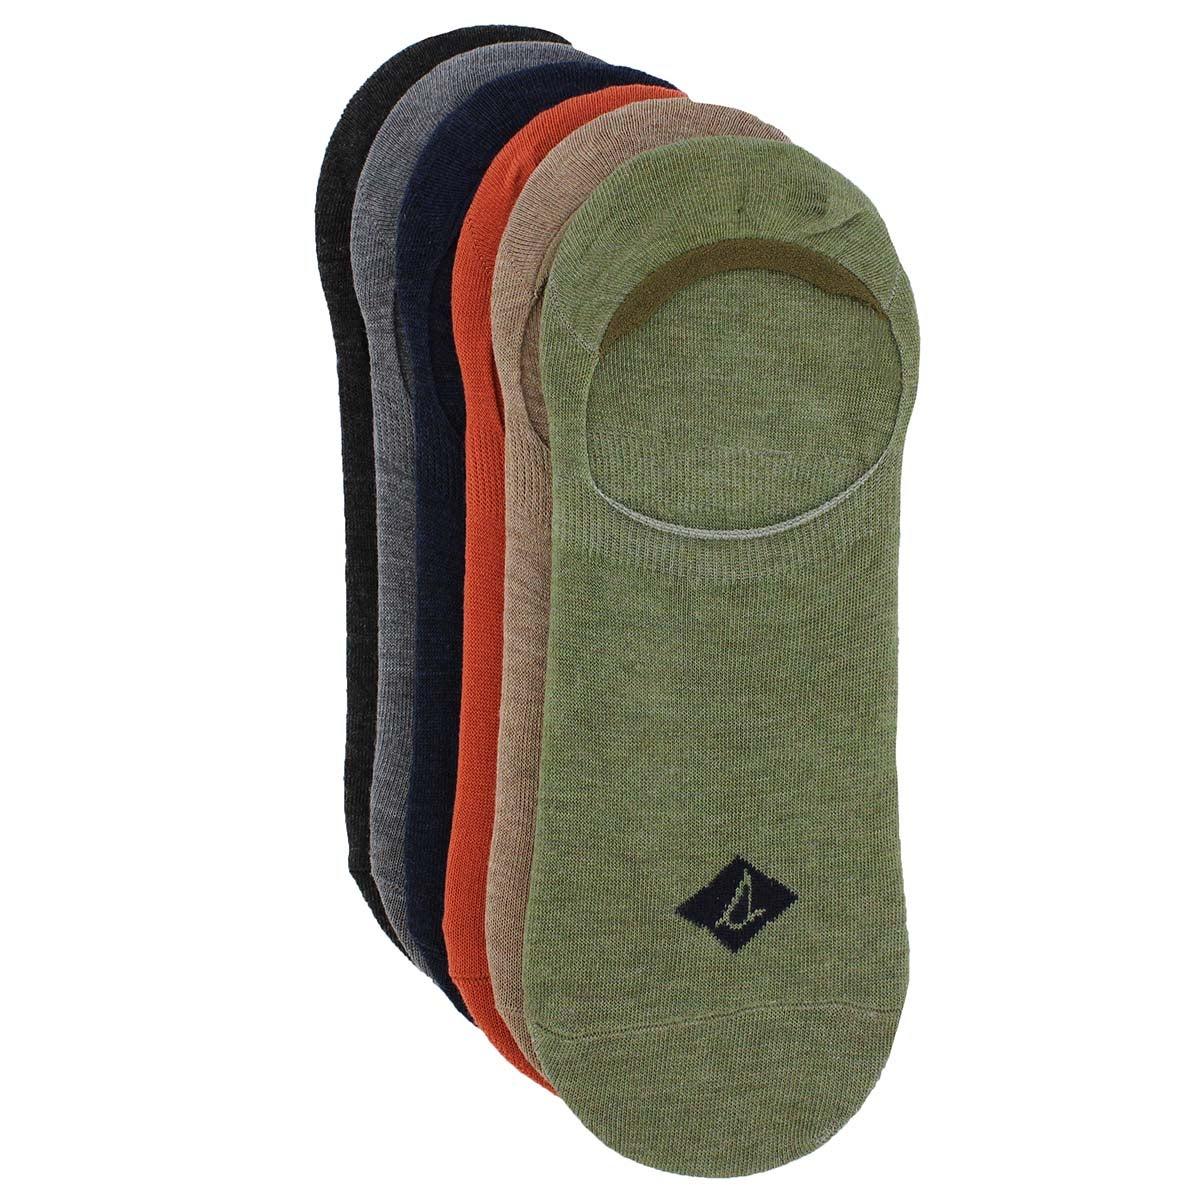 Socquettes hautes SOLID, multicolore, 6p, hommes